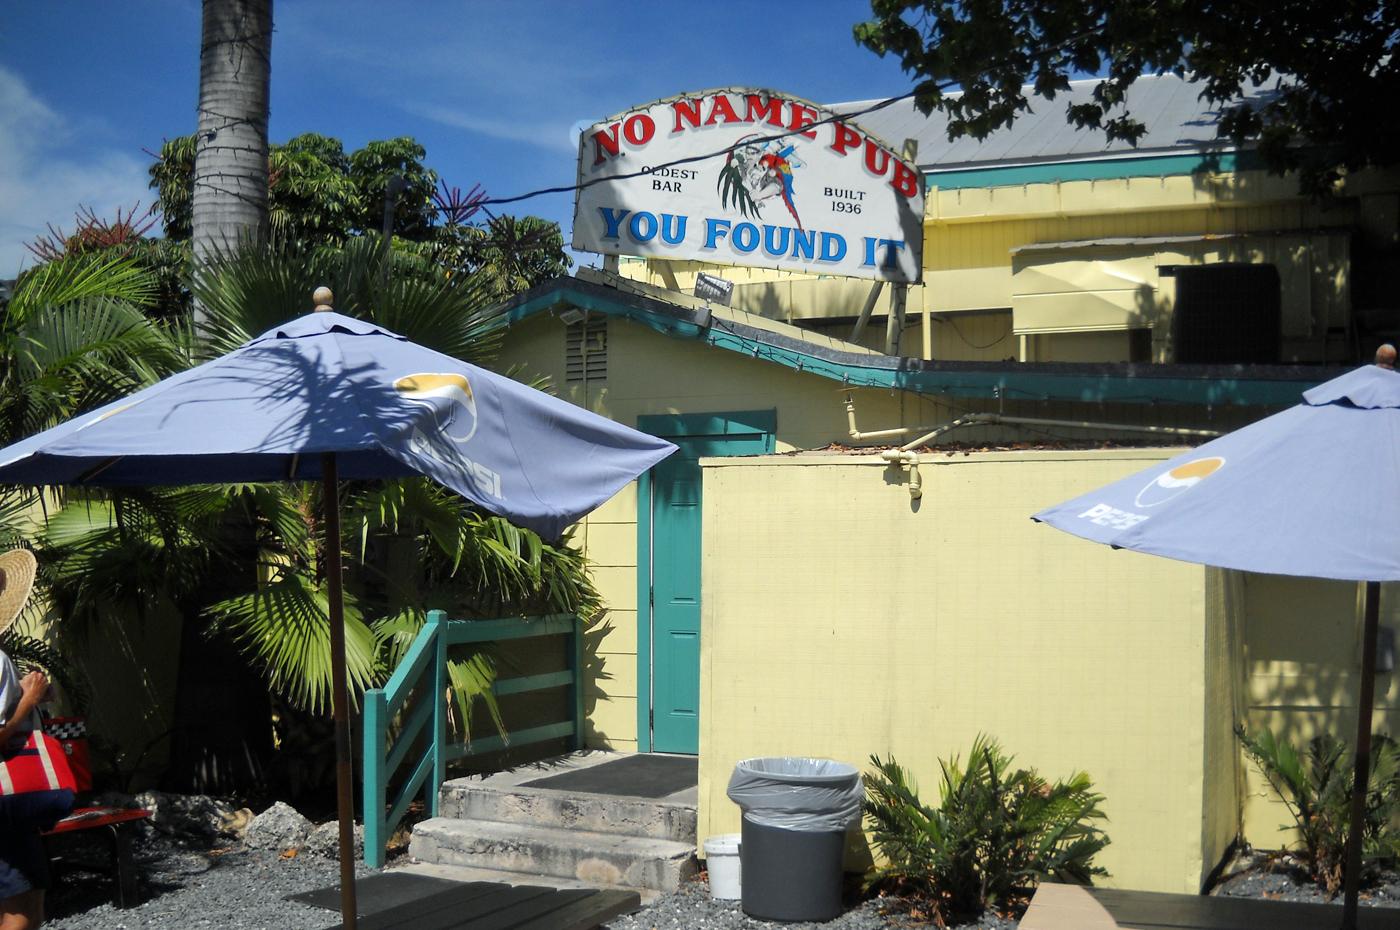 No Name Pub on Big Pine Key exterior